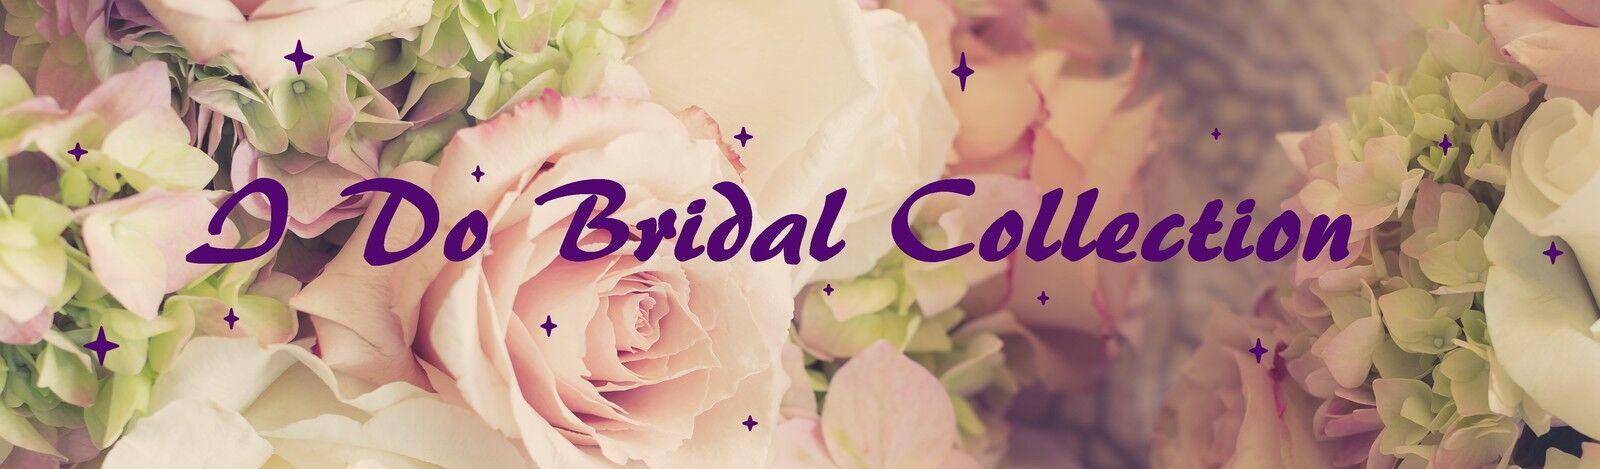 I Do Bridal Collection